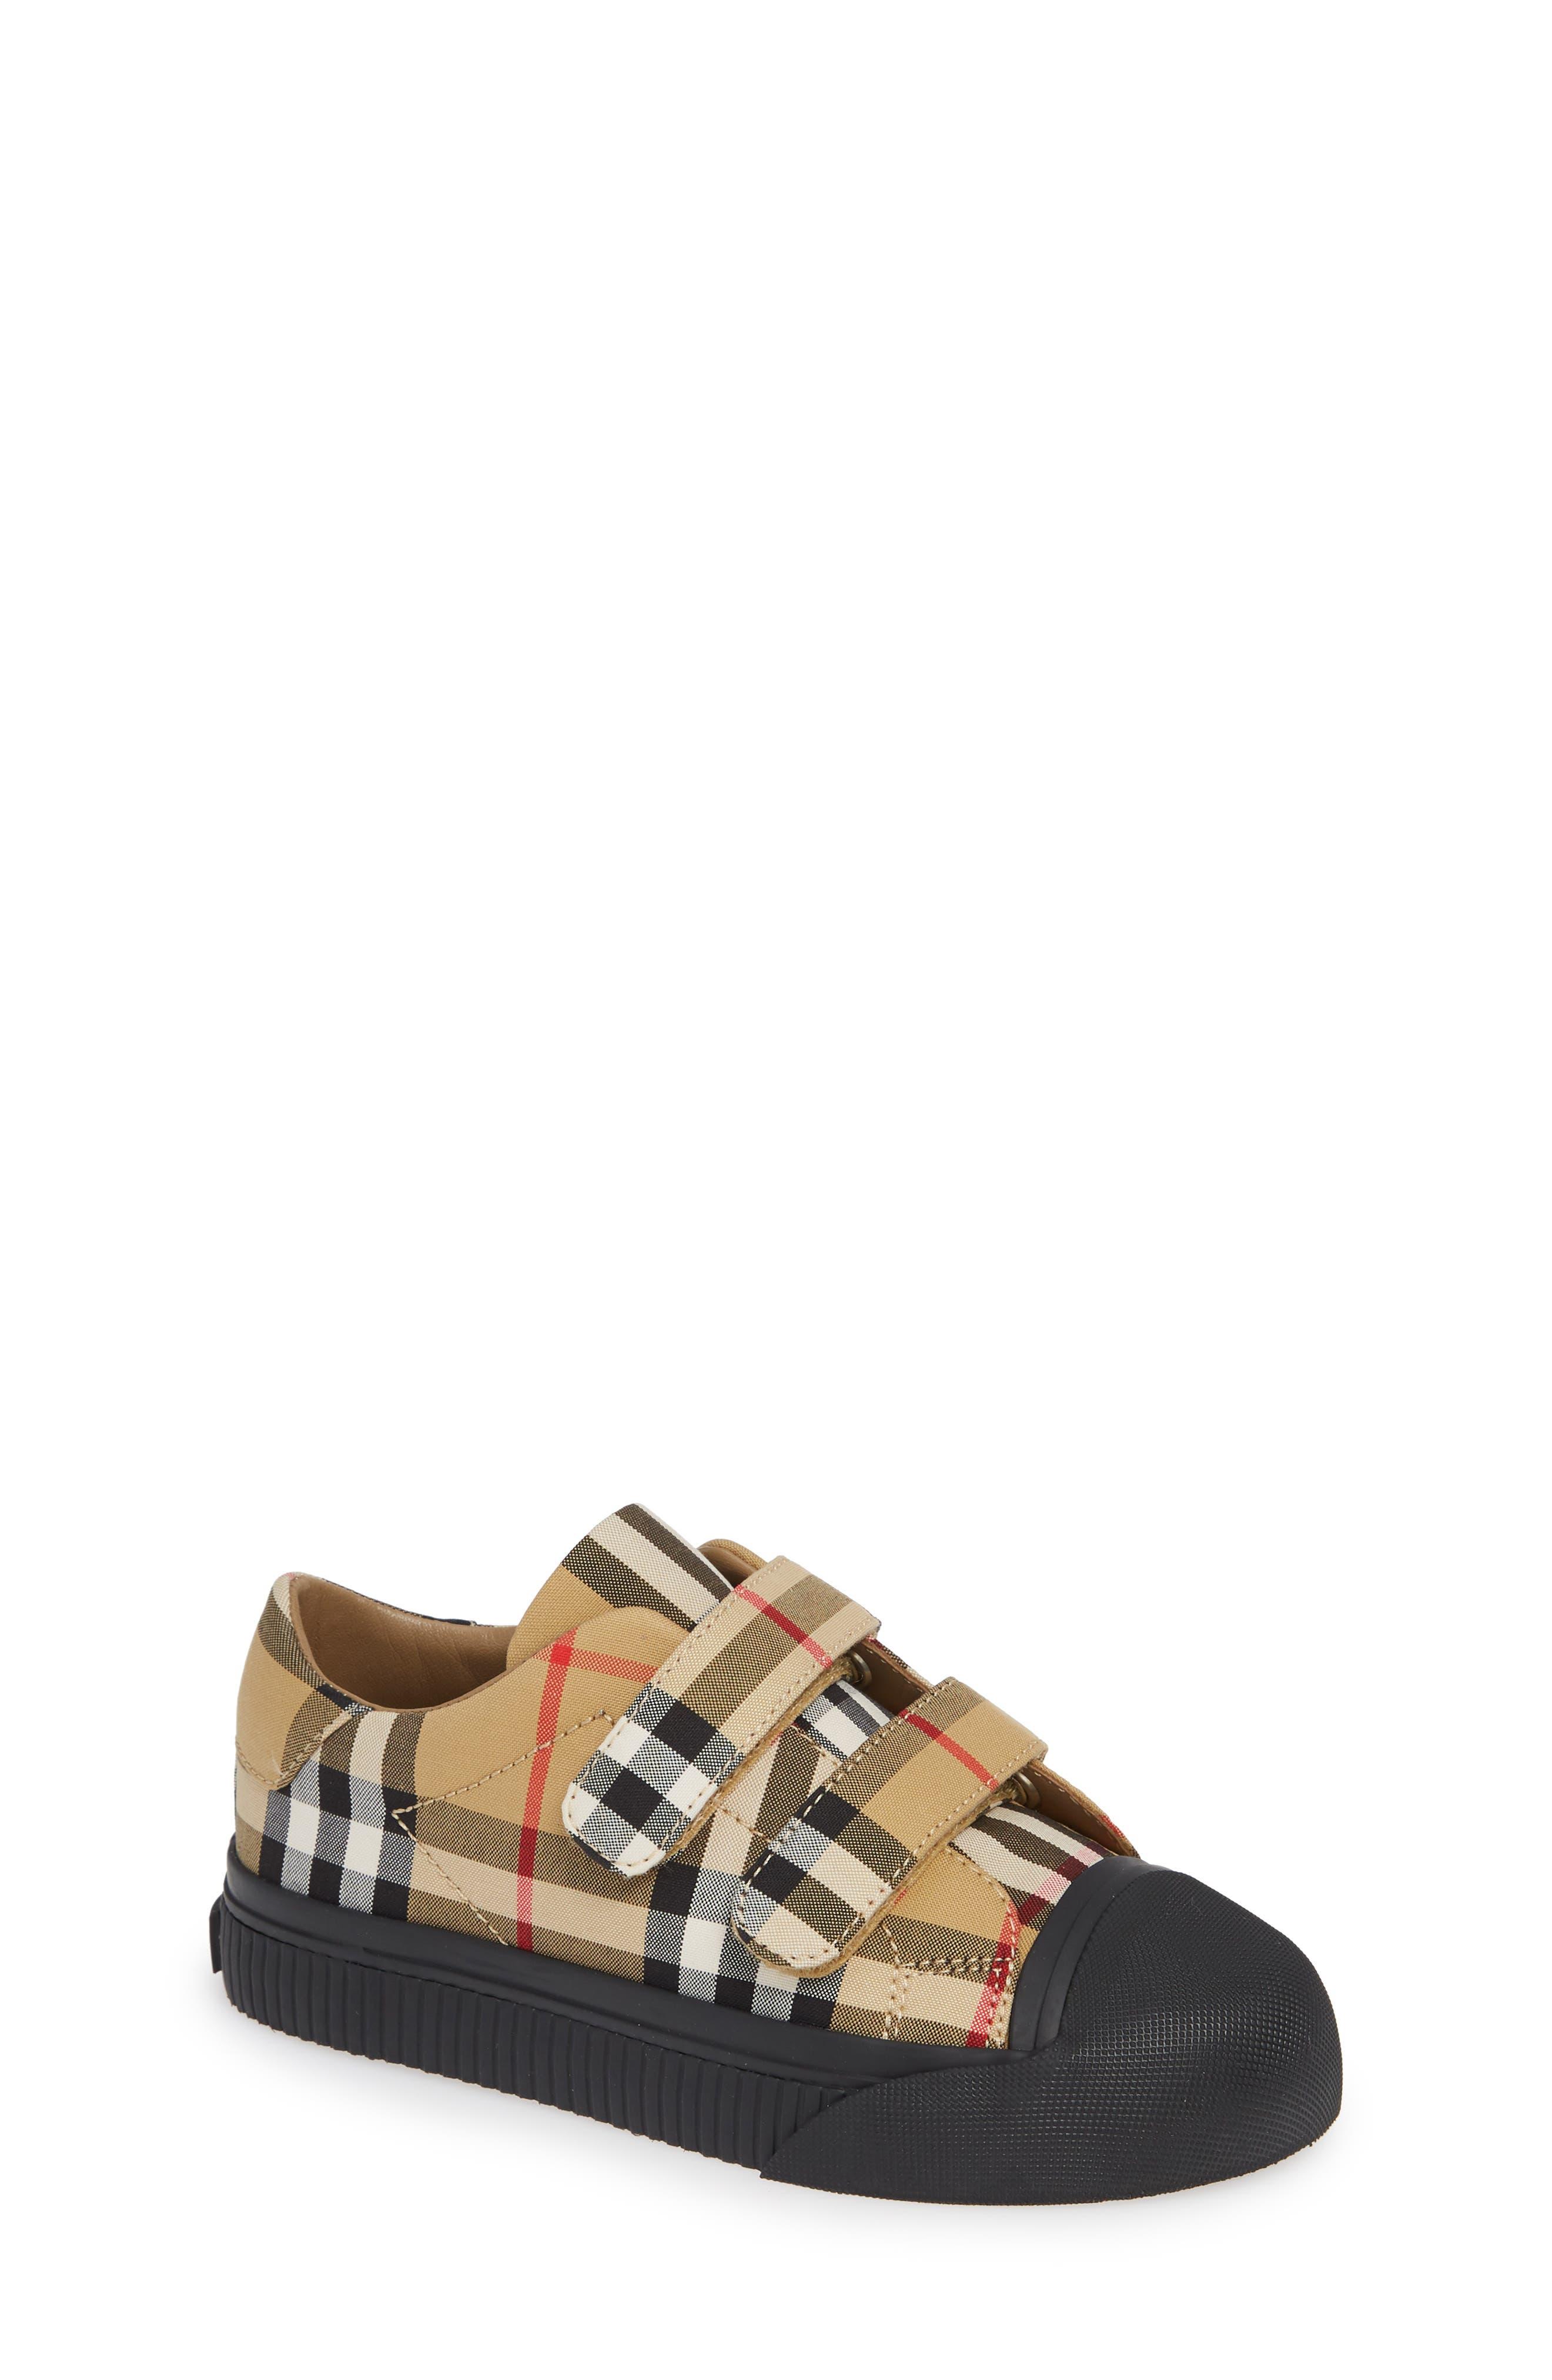 Belside Sneaker,                             Main thumbnail 1, color,                             ANTIQUE YELLOW/ BLACK